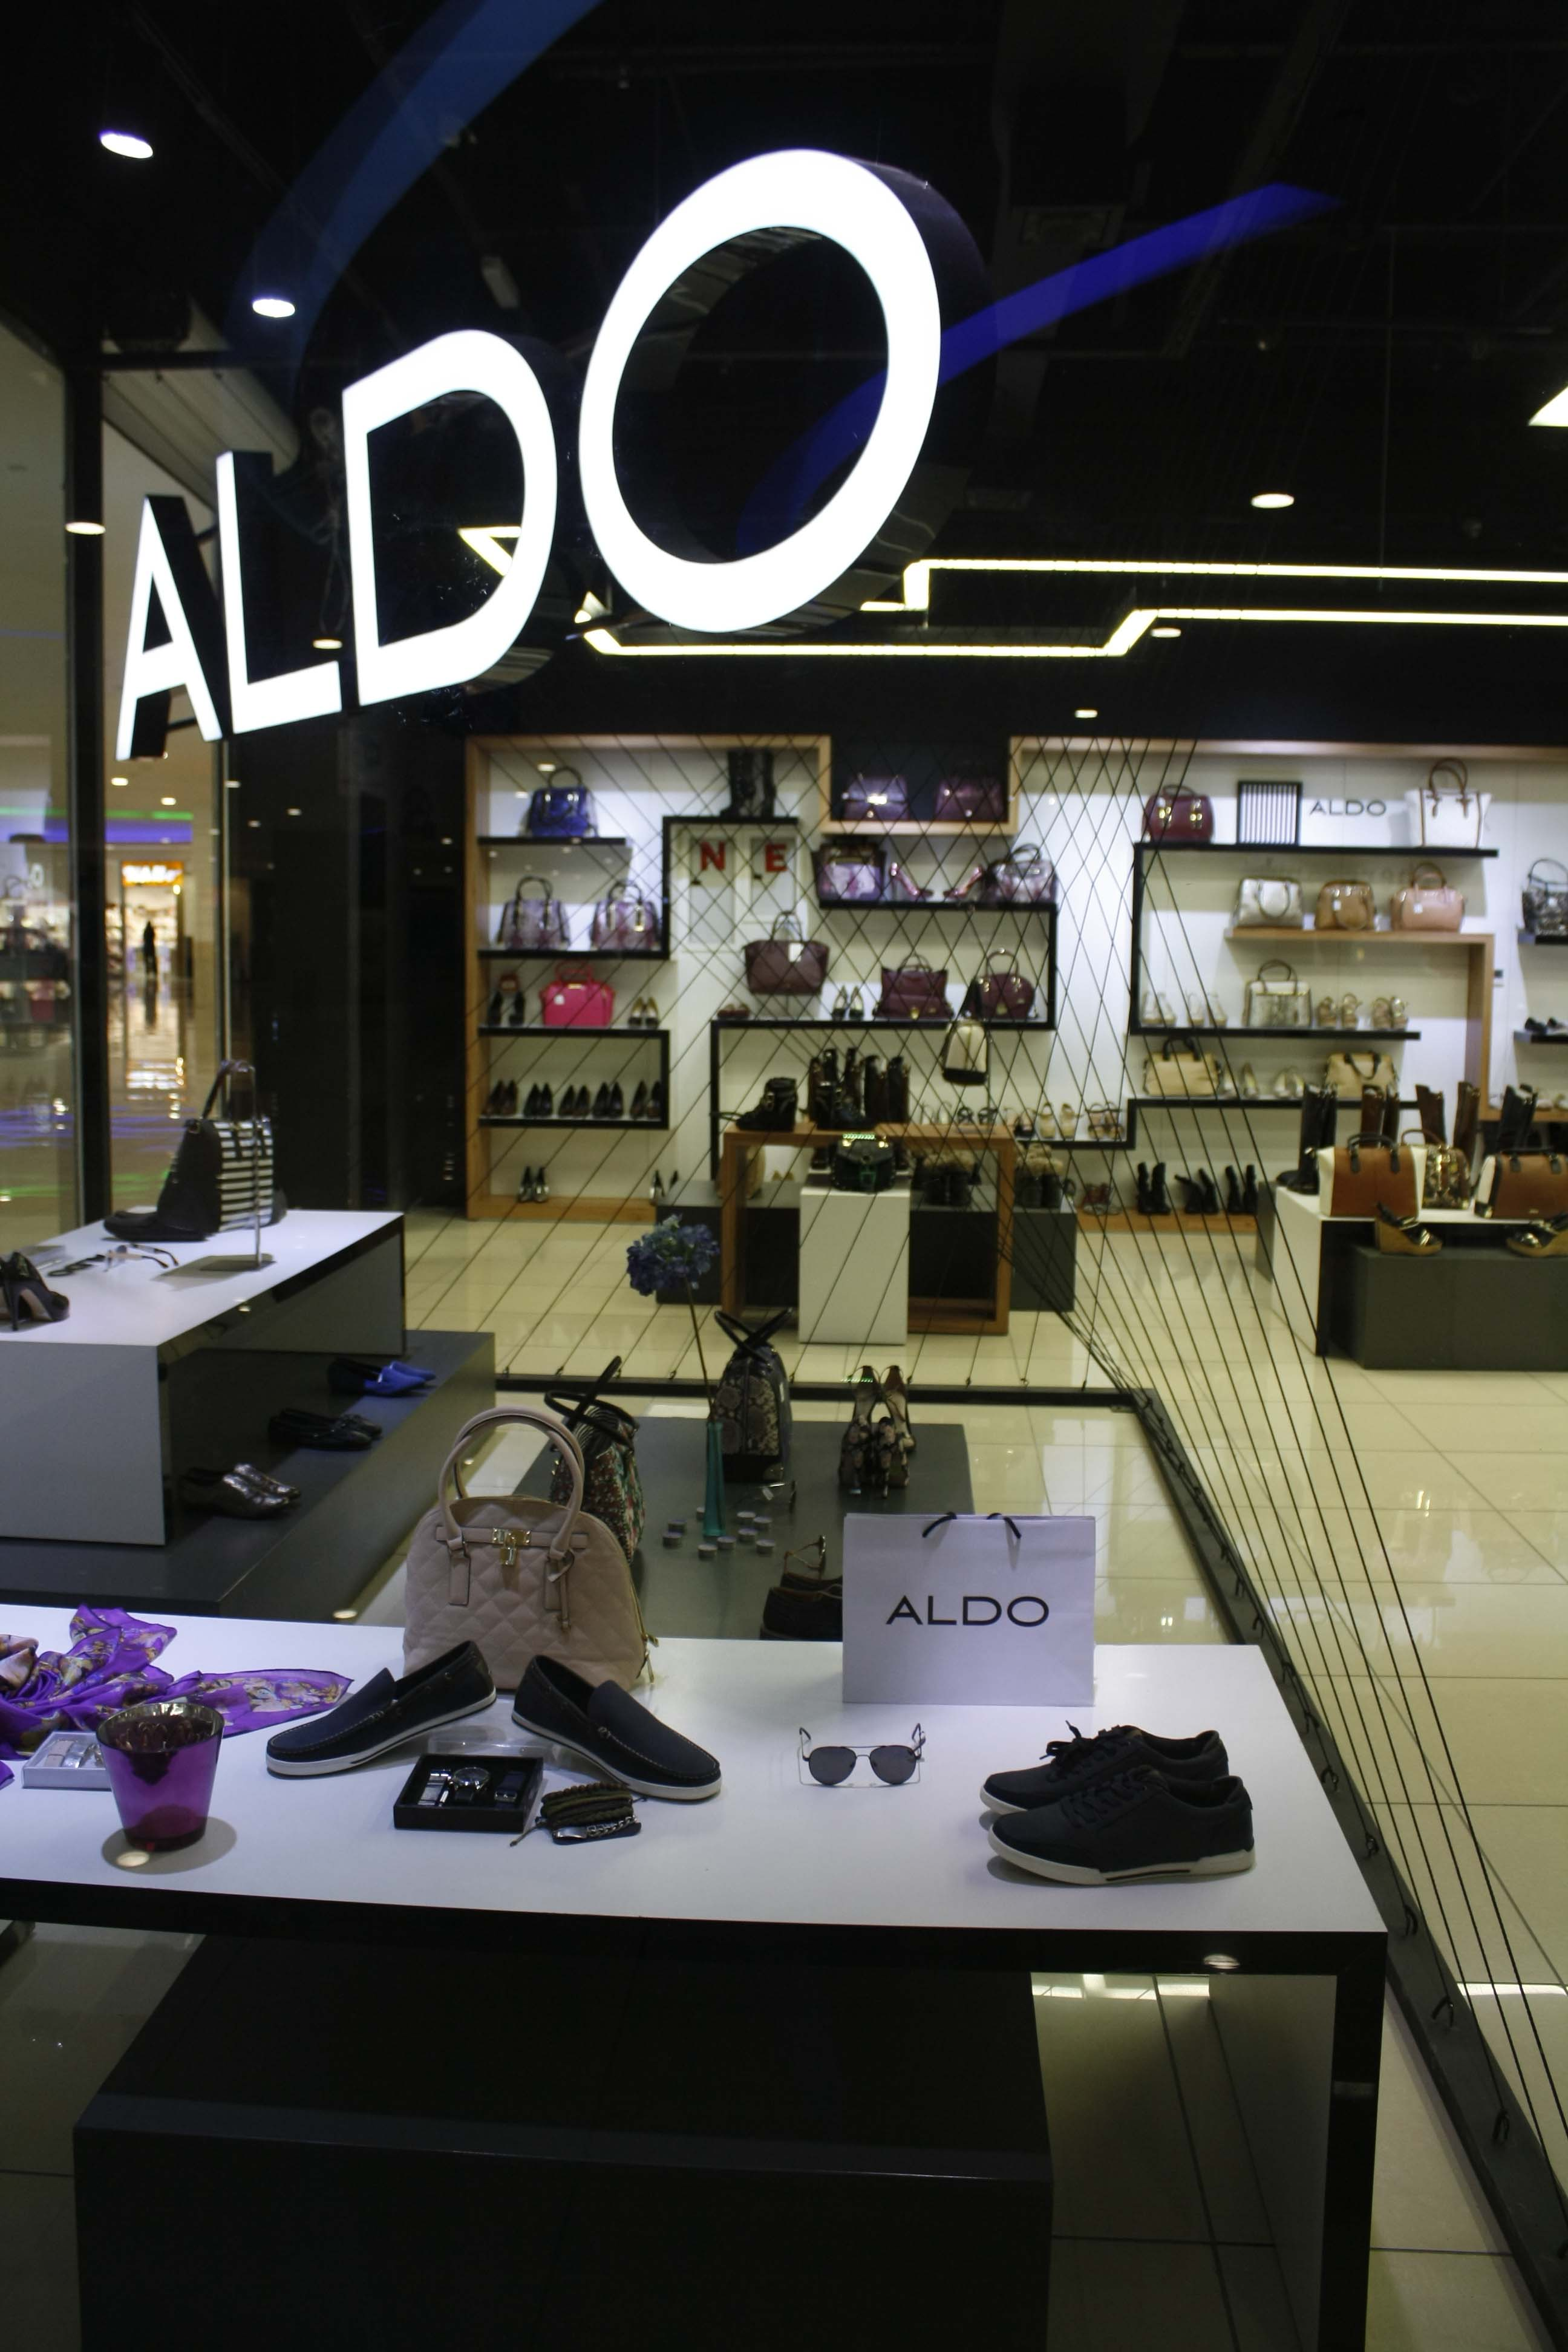 ALDO collection Shop interior